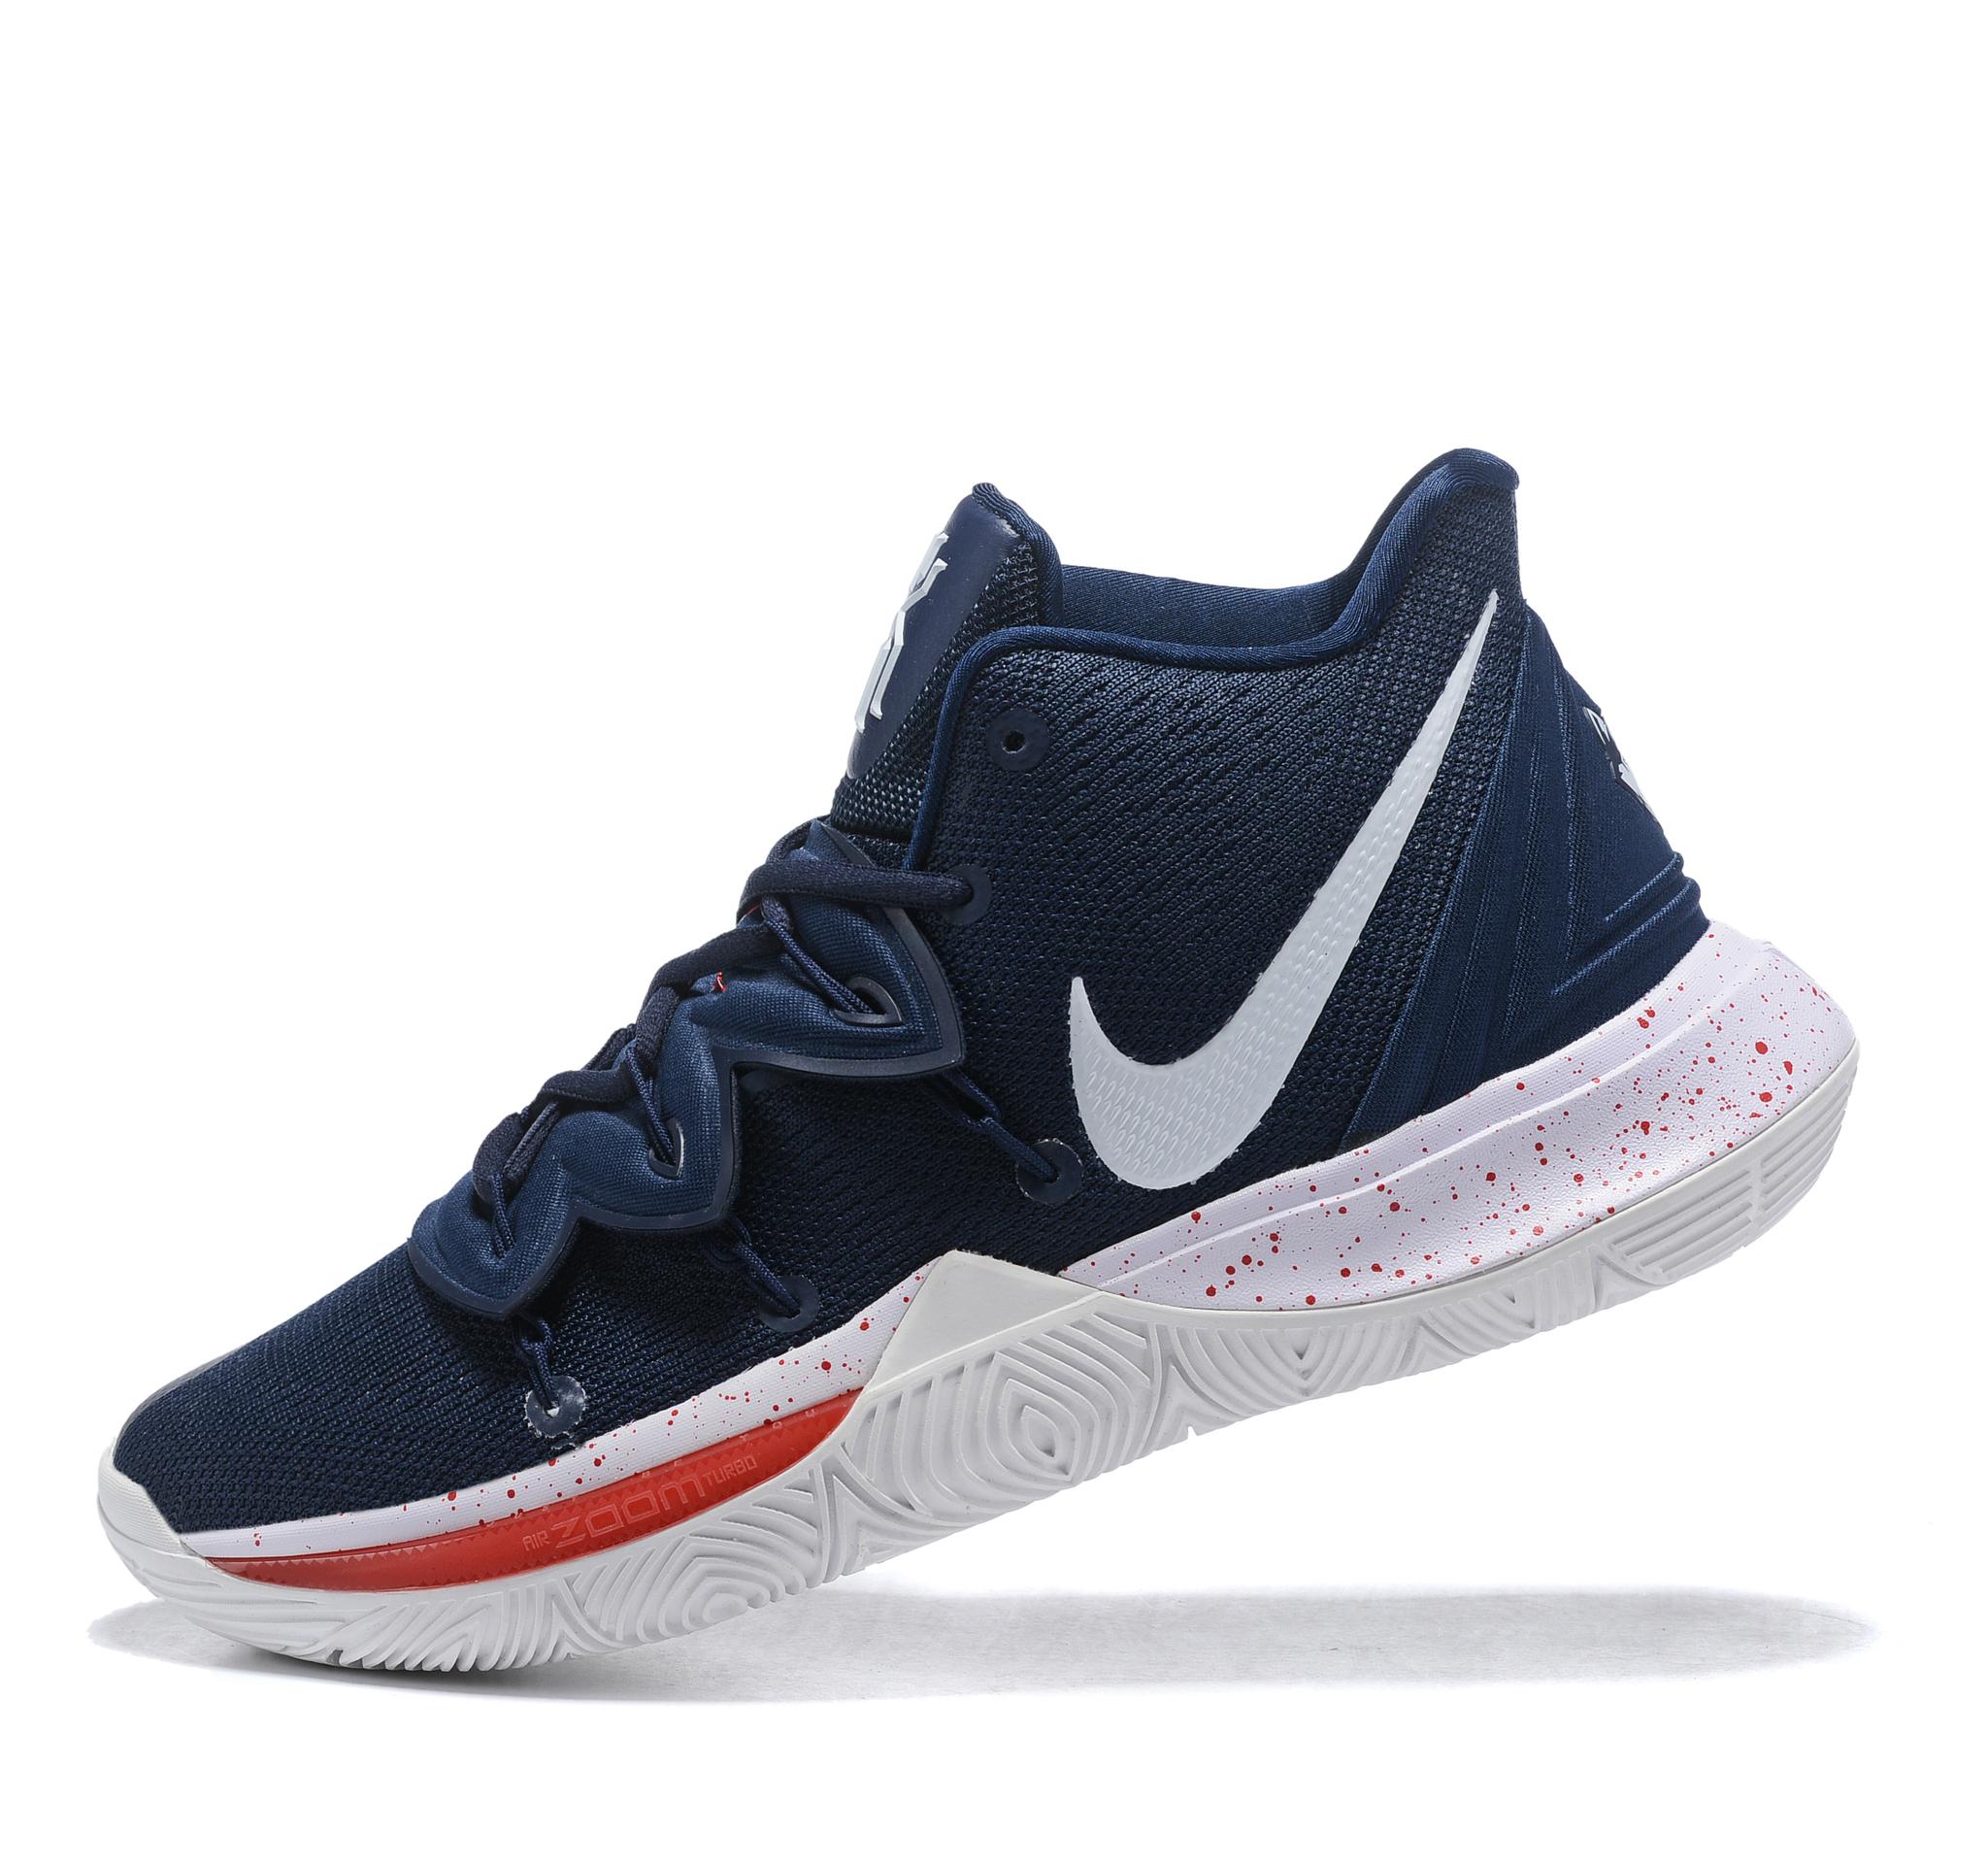 dde5f6a5 Купить кроссовки для баскетбола Nike Kyrie 5! Баскетбольный интернет ...